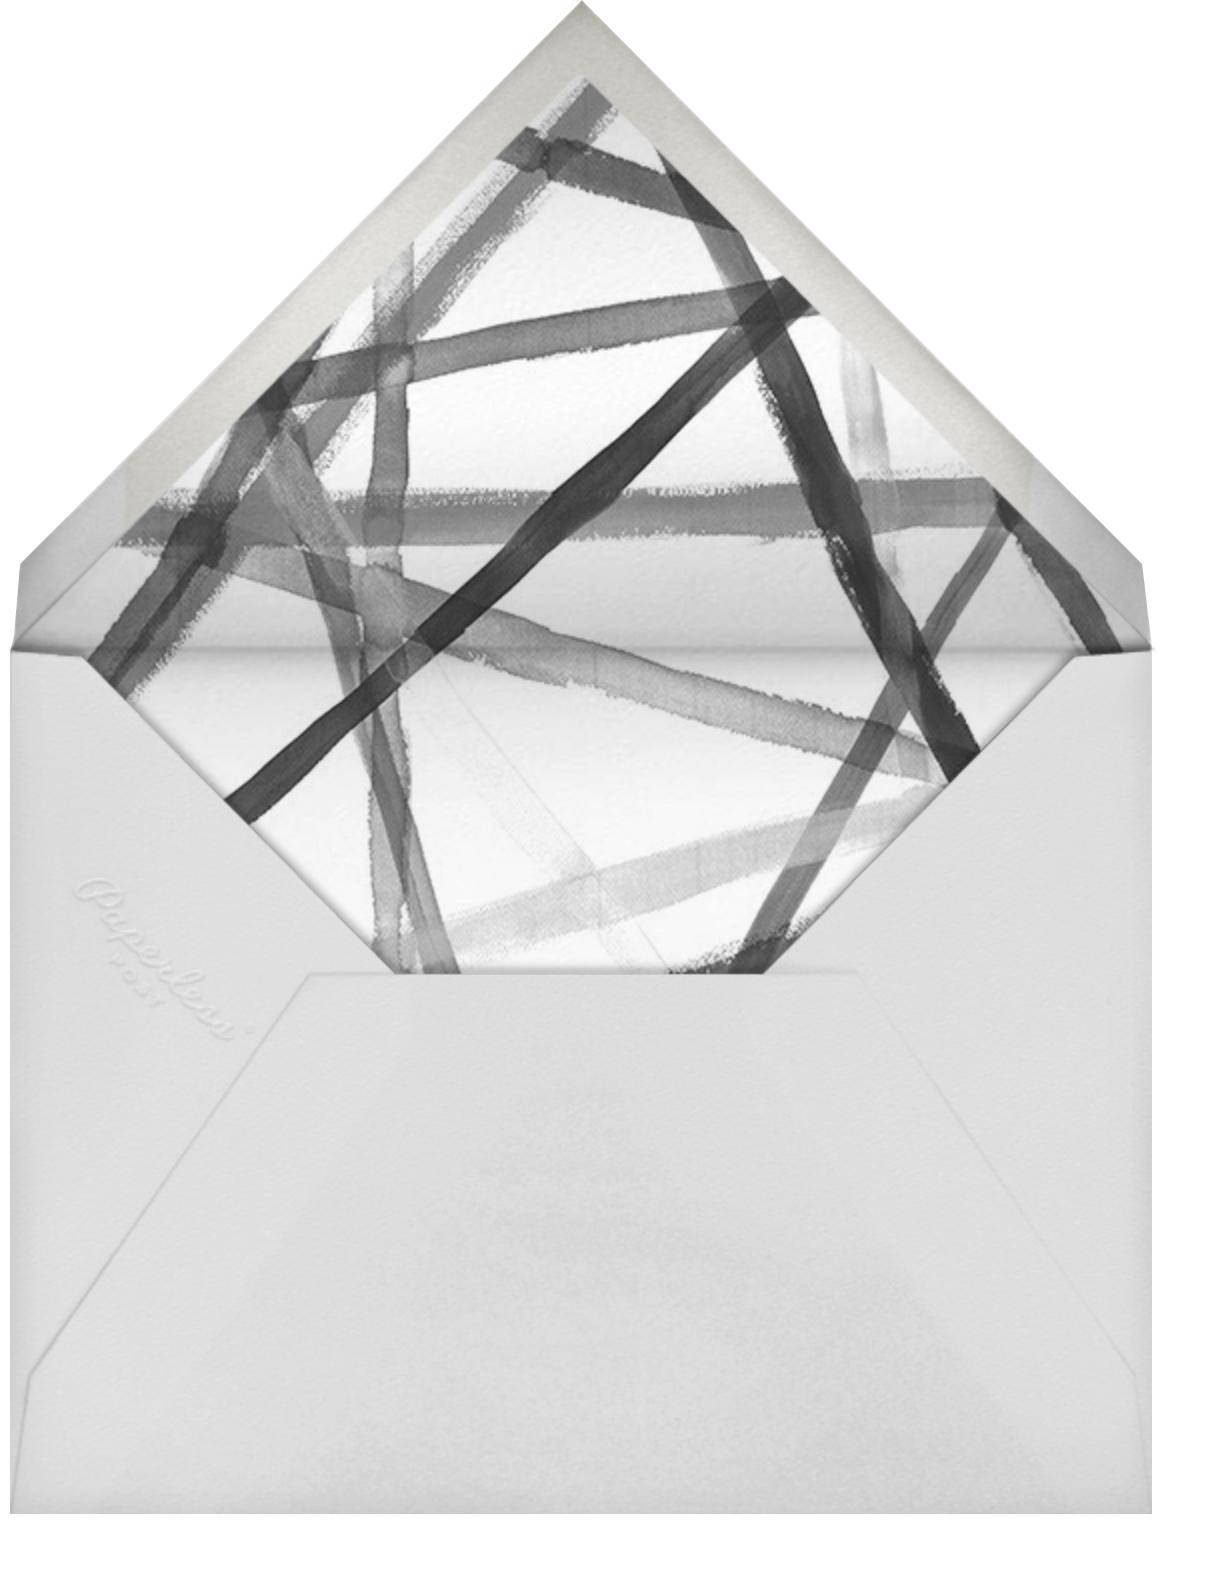 Channels Photo - White/Gold - Kelly Wearstler - New Year - envelope back